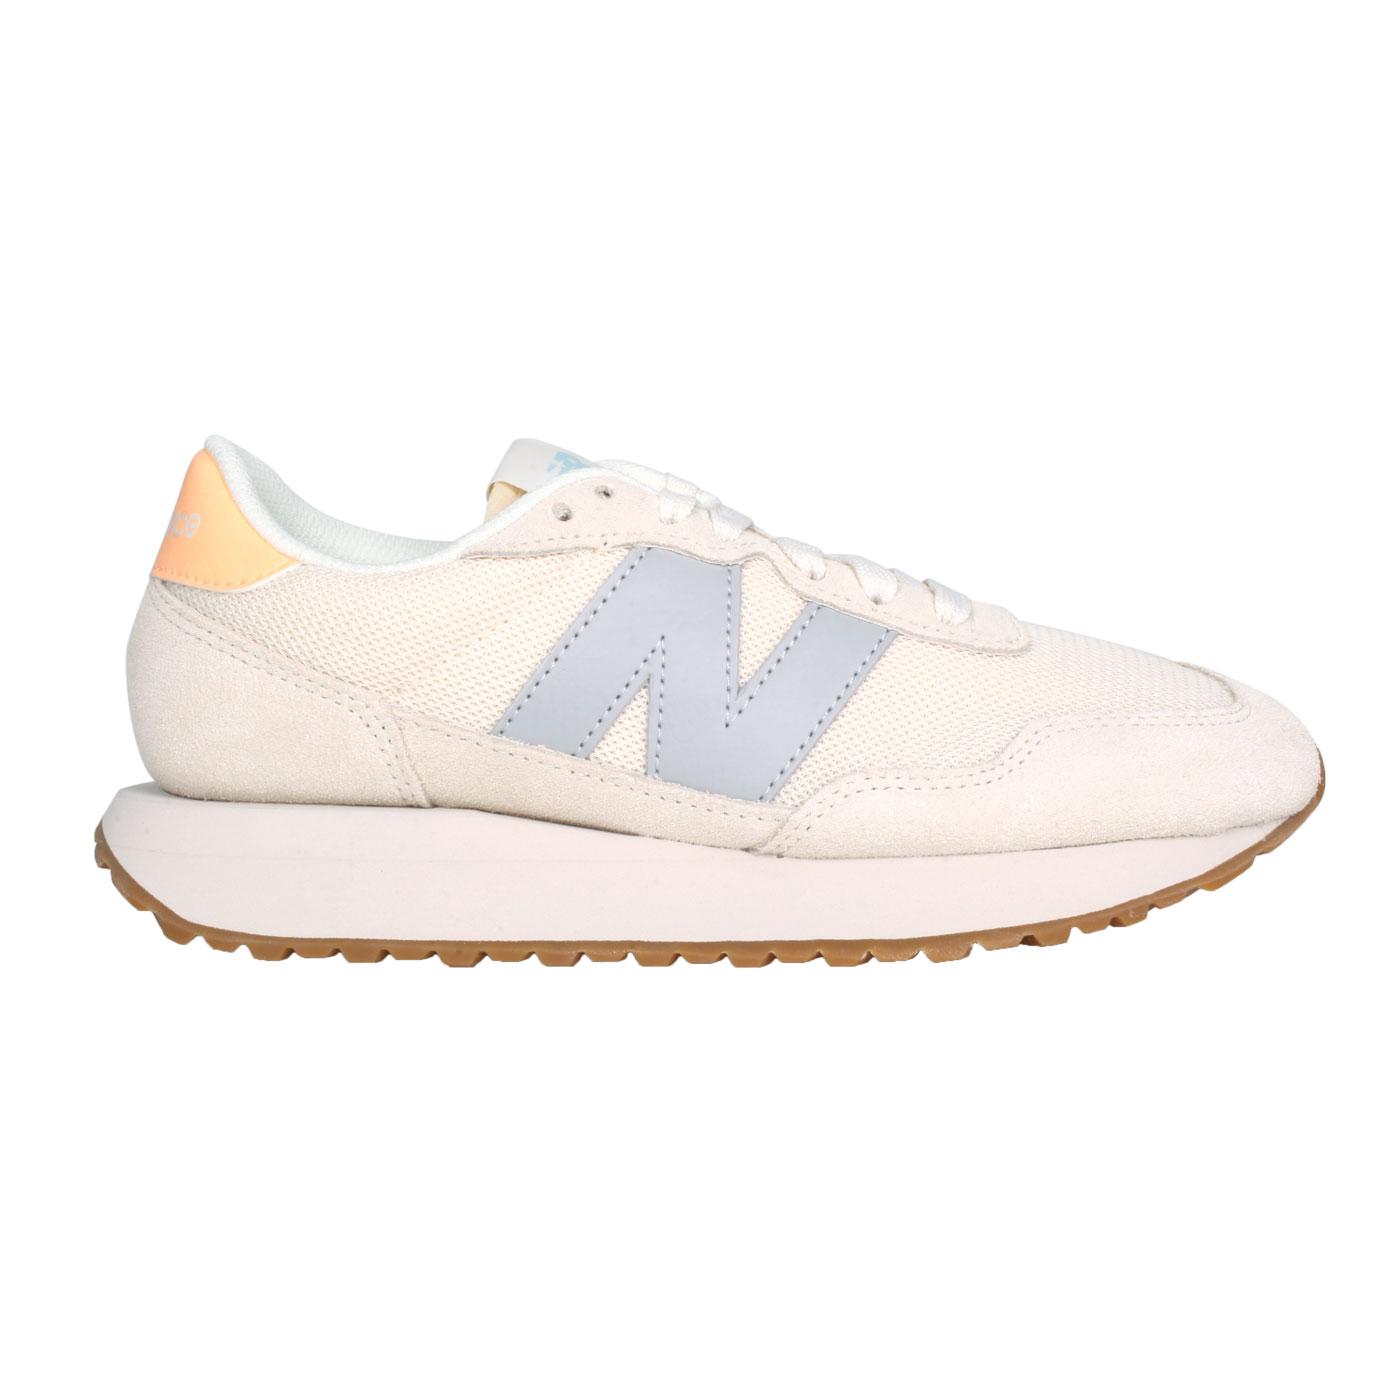 NEW BALANCE 女款休閒運動鞋 WS237HN1